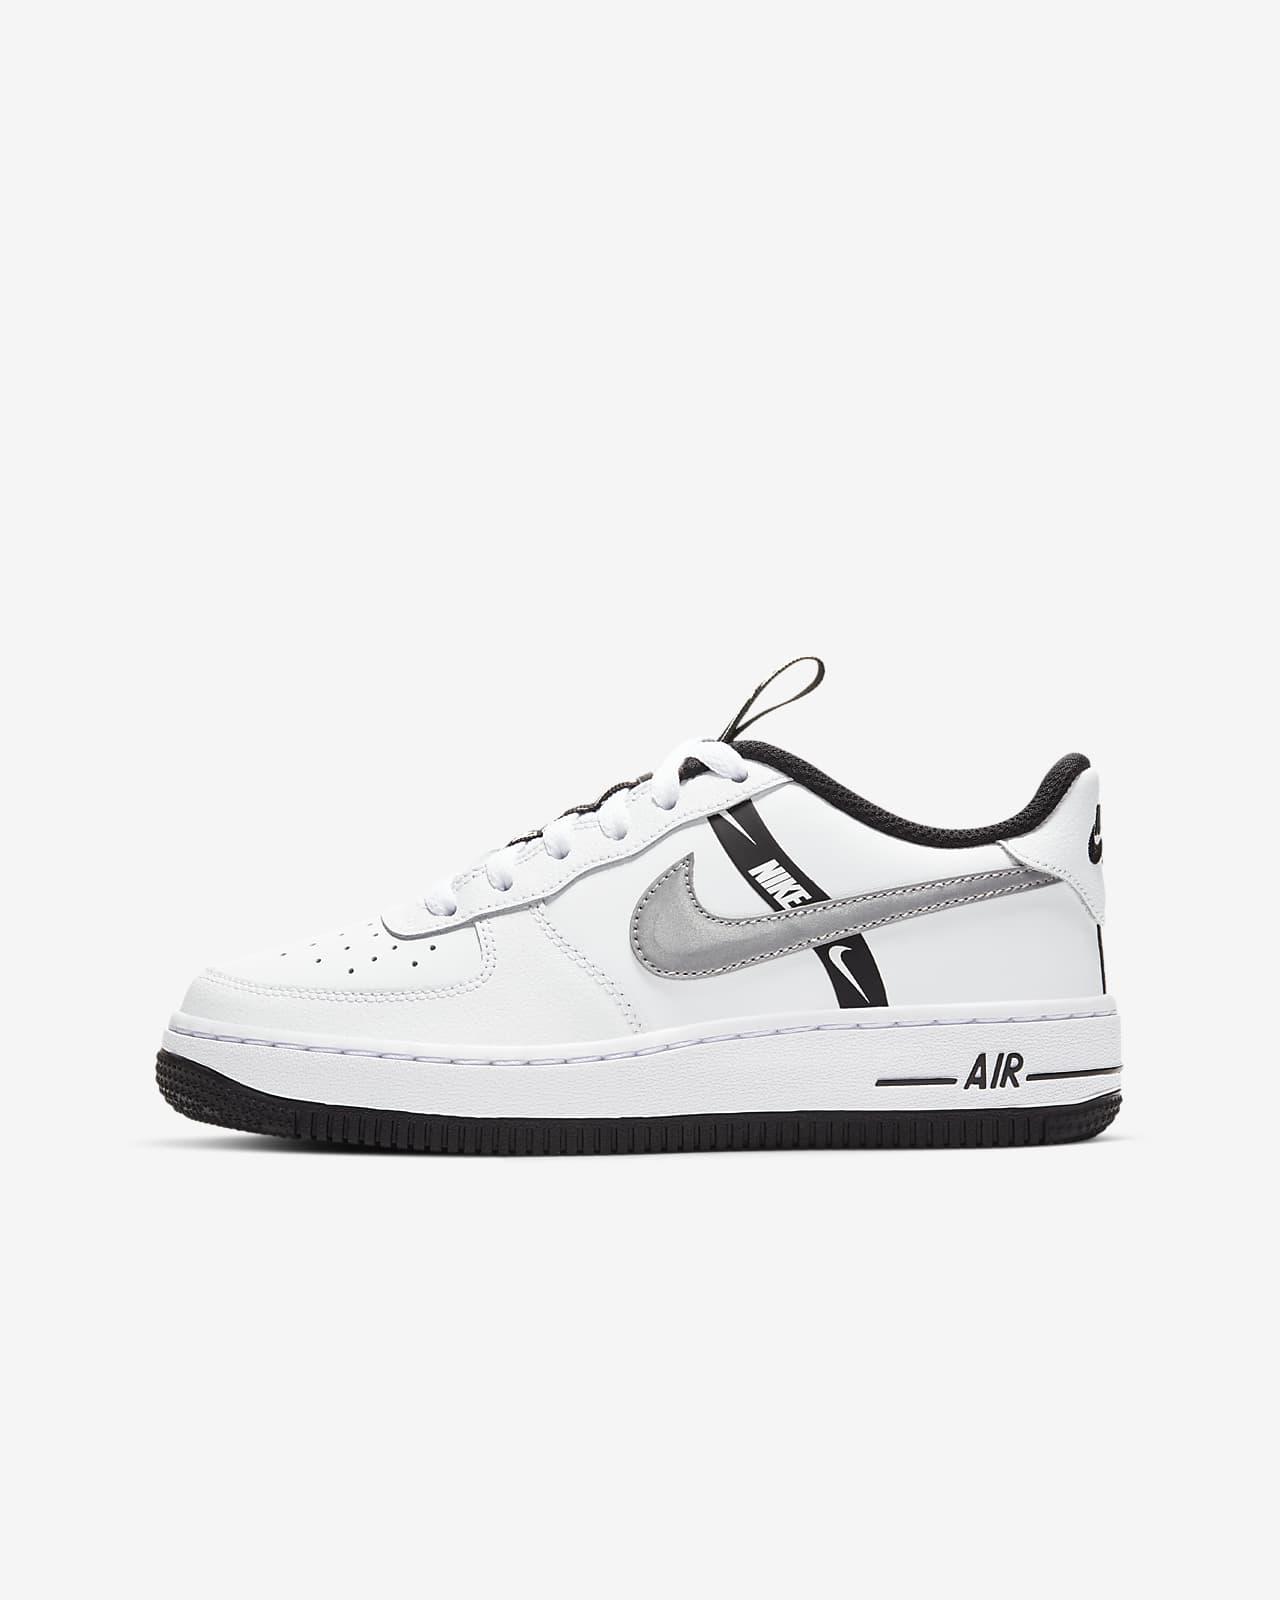 Nike Air Force 1 LV8 Zapatillas - Niño/a